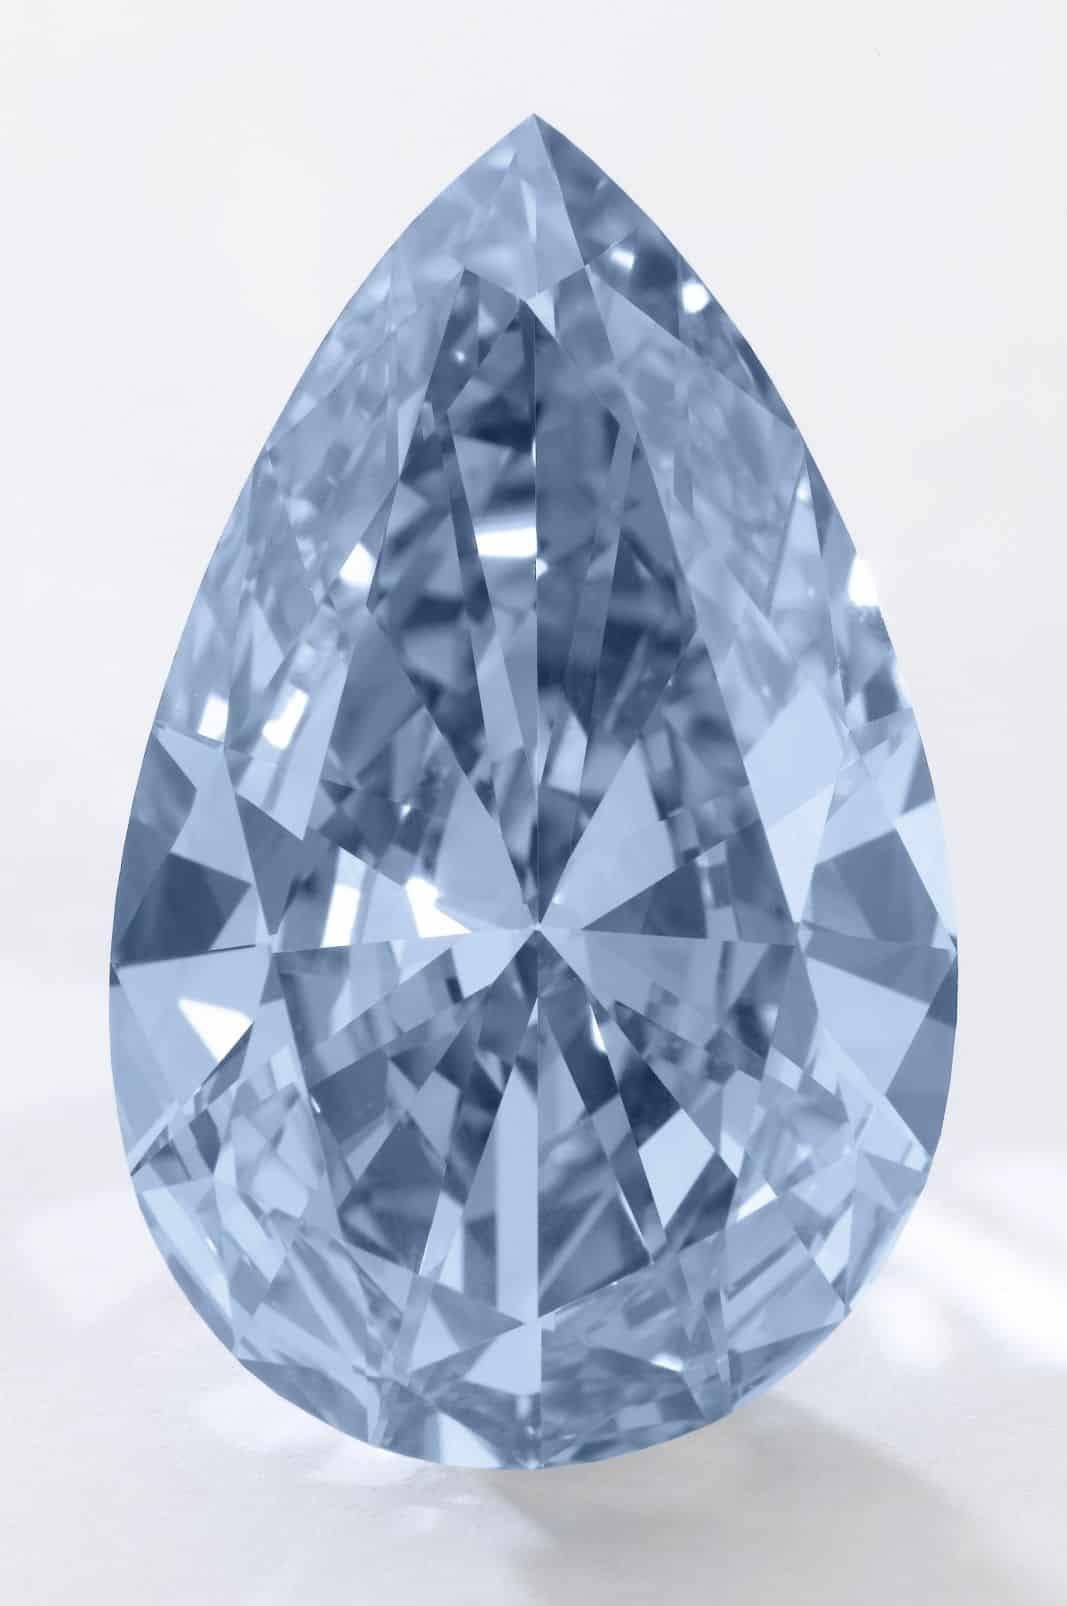 Lot 377 - 14.54-carat, pear-shaped, fancy vivid blue, internally flawless Apollo Diamond unmounted